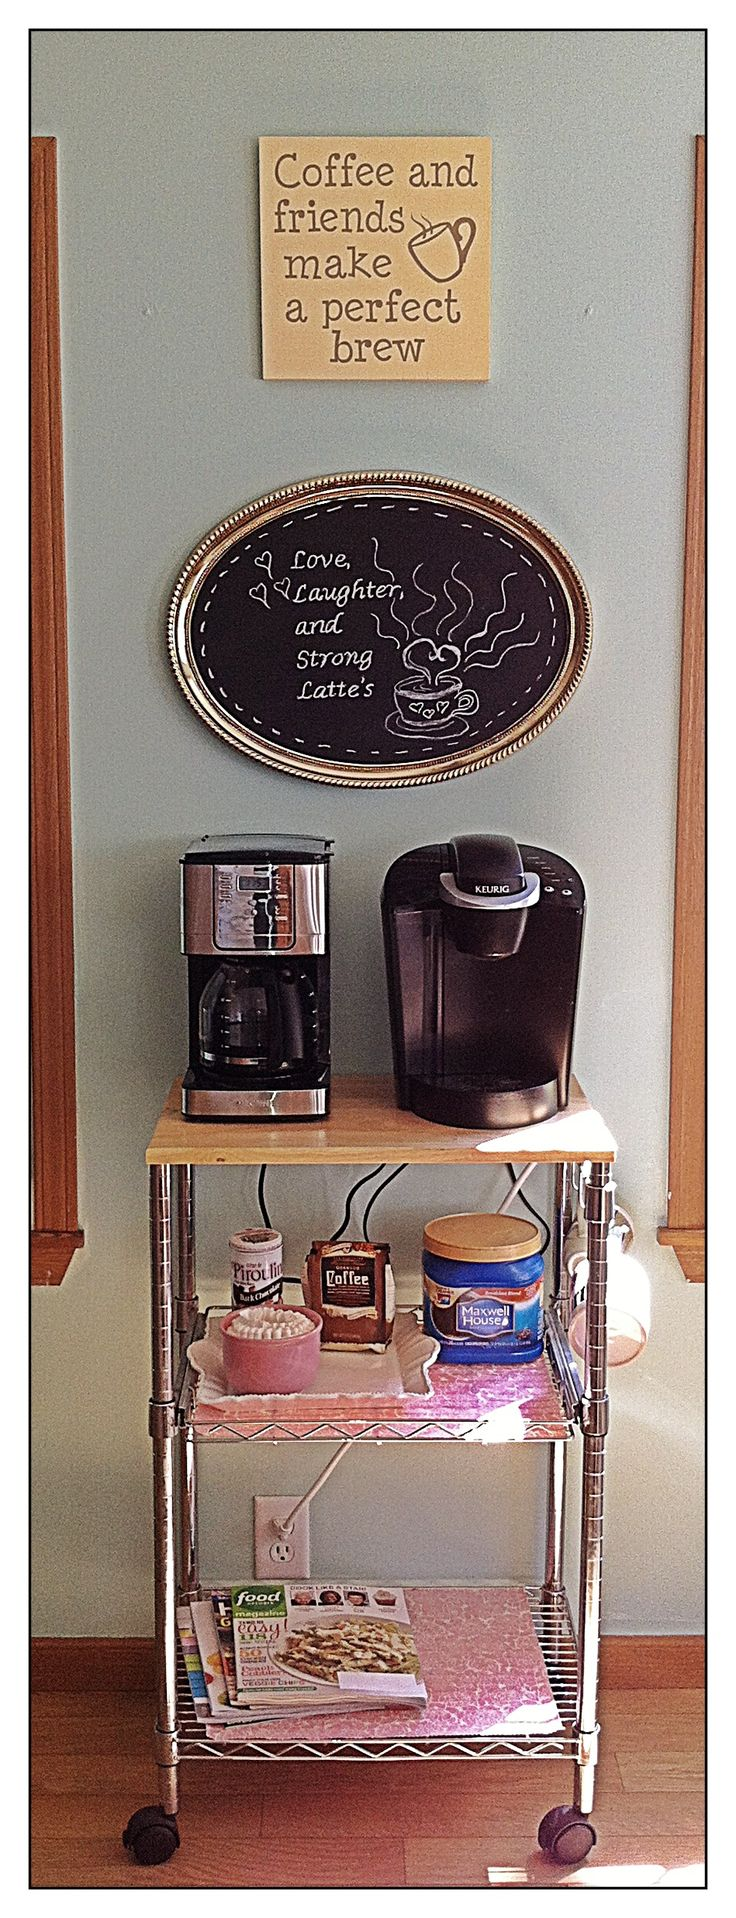 My new coffee station!